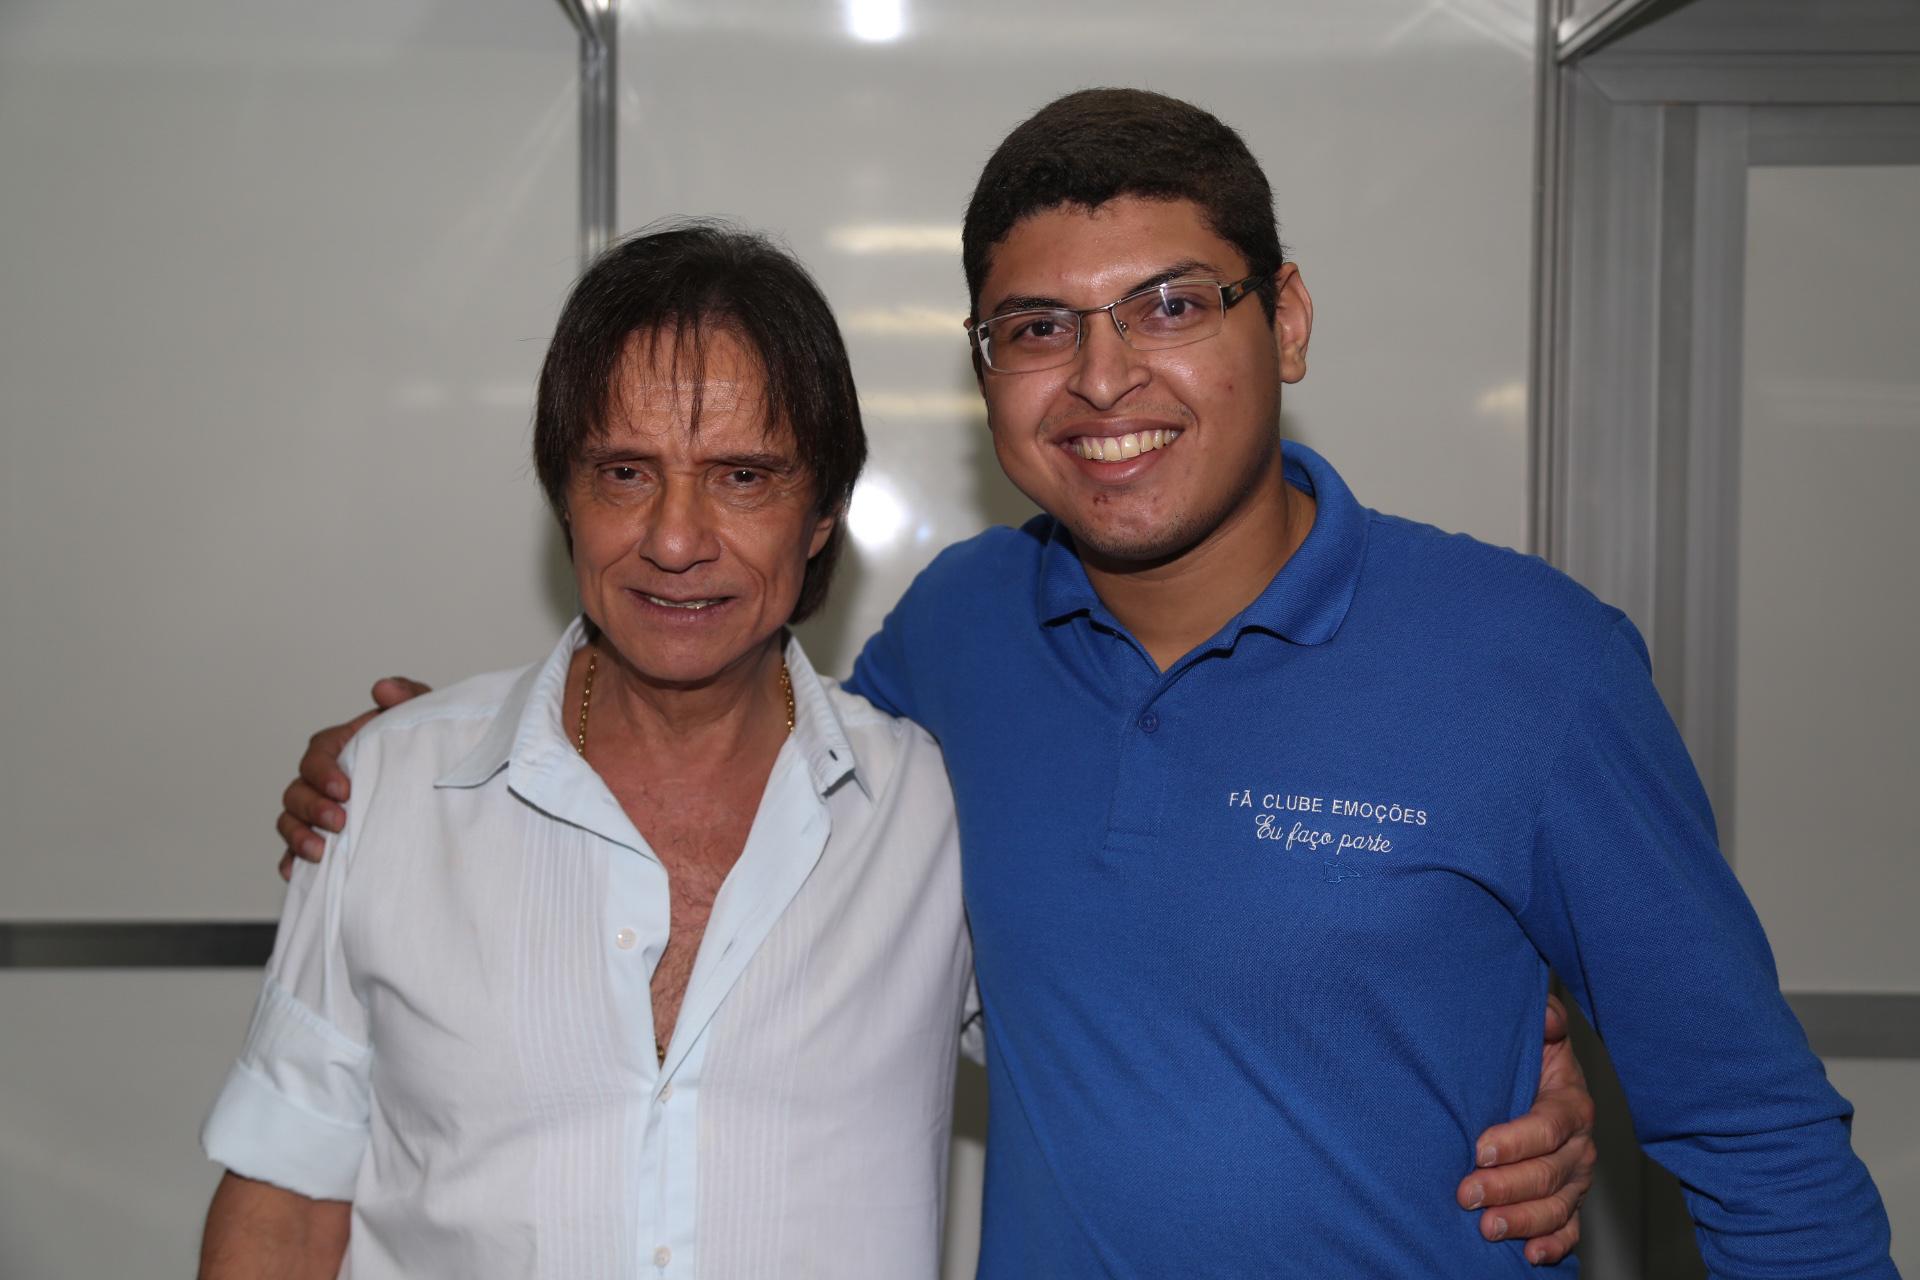 Roberto Johntaham Duarte Pereira